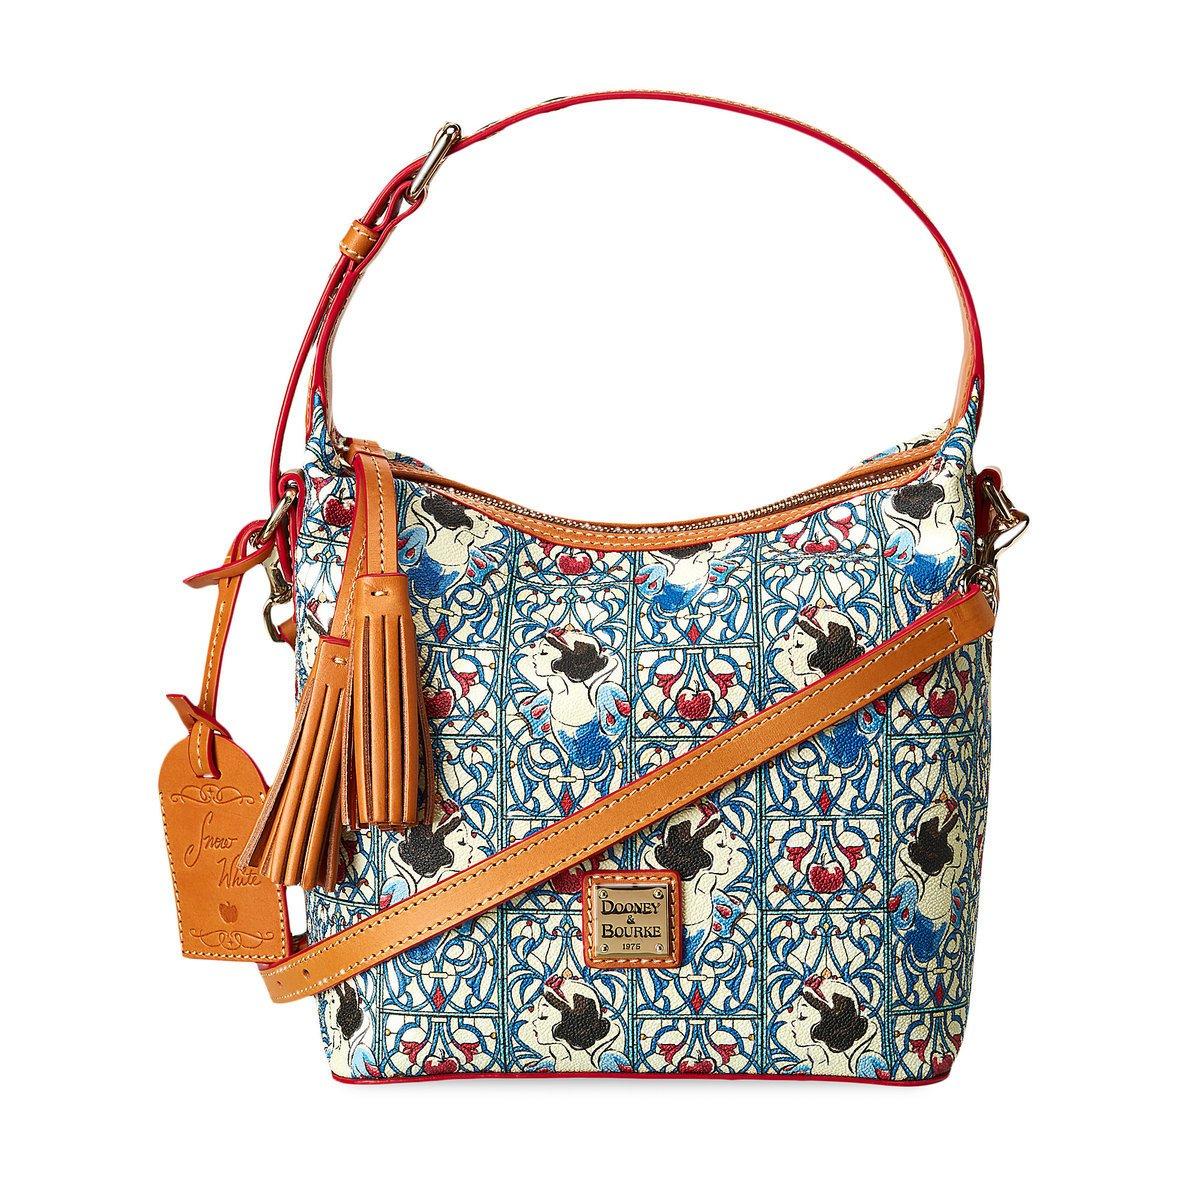 Disney Dooney & Bourke Princess Snow White Tassel Crossbody Bag